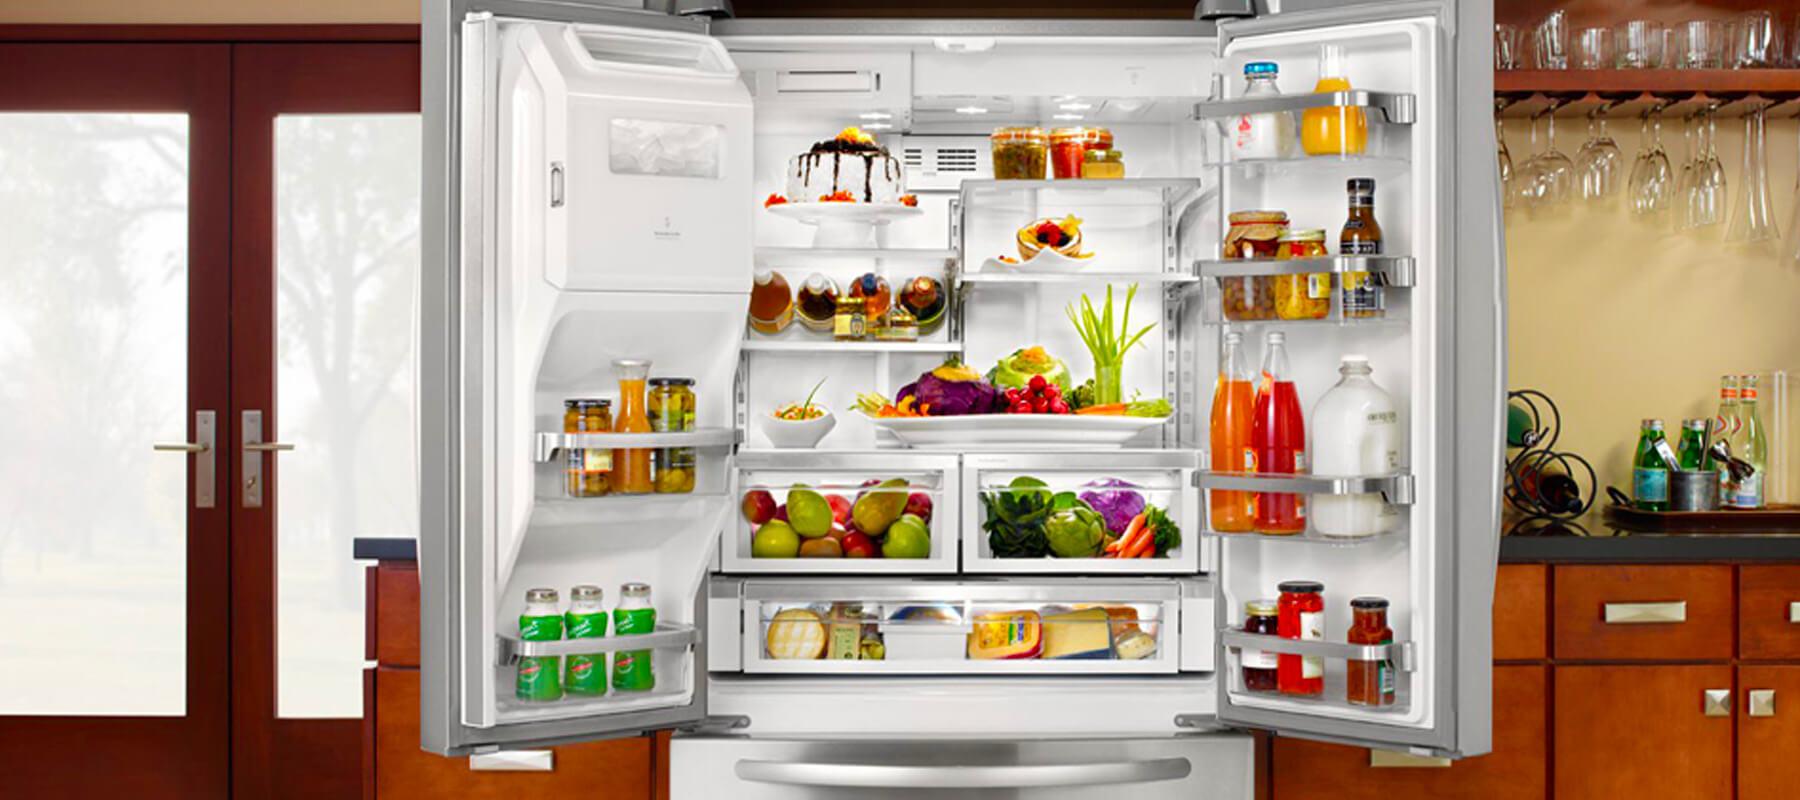 Built in Counter Depth Refrigerator Mission Viejo | Built-in Refrigerator Repair